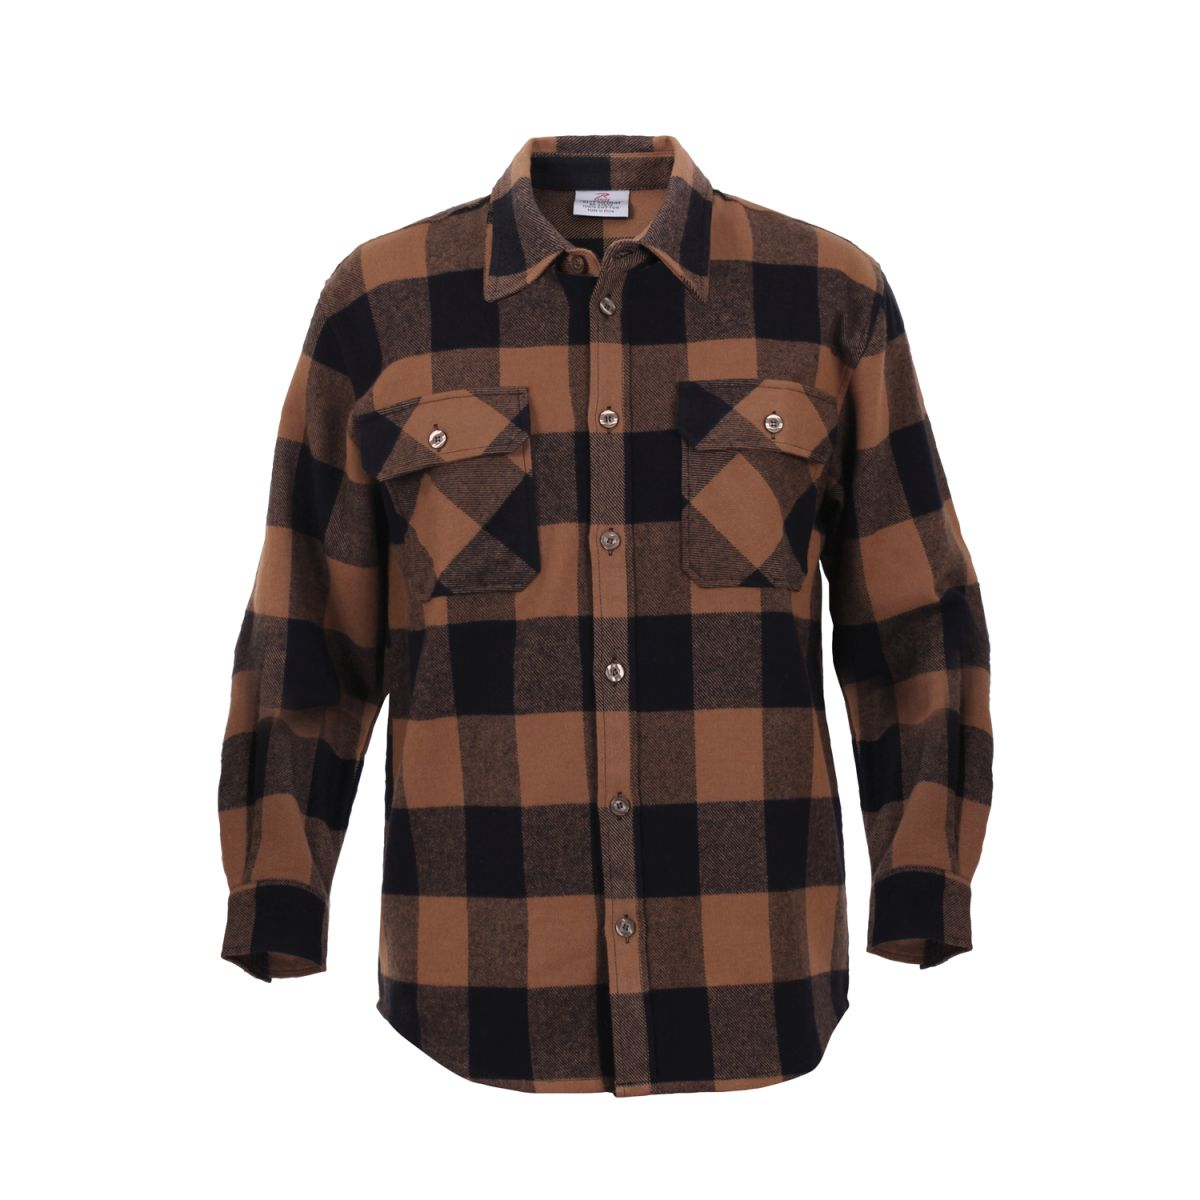 Košile dřevorubecká FLANNEL kostkovaná HNĚDÁ ROTHCO 4667 L-11